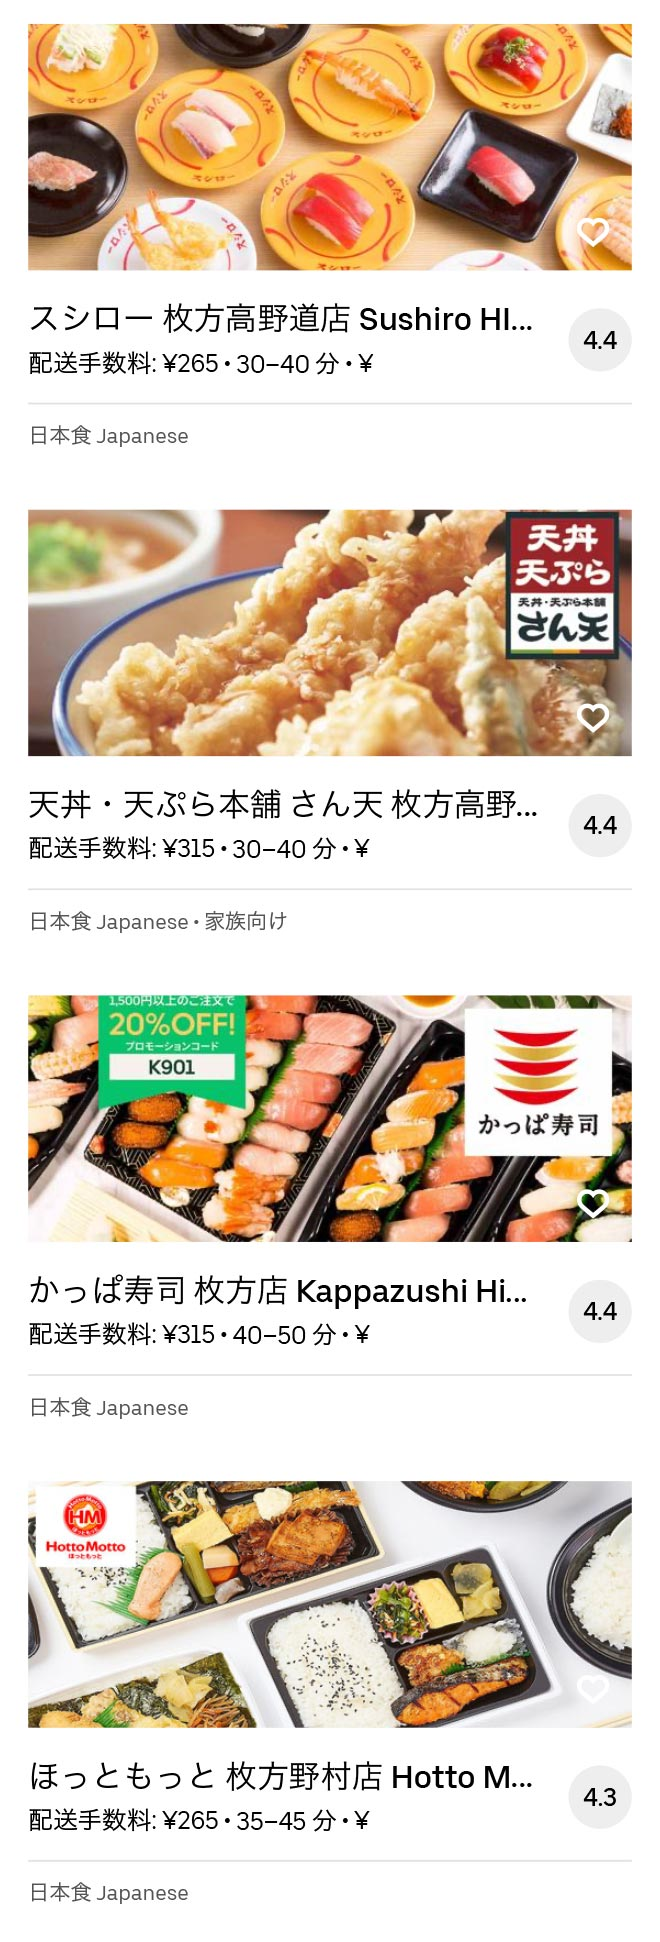 Nagao menu 2010 05